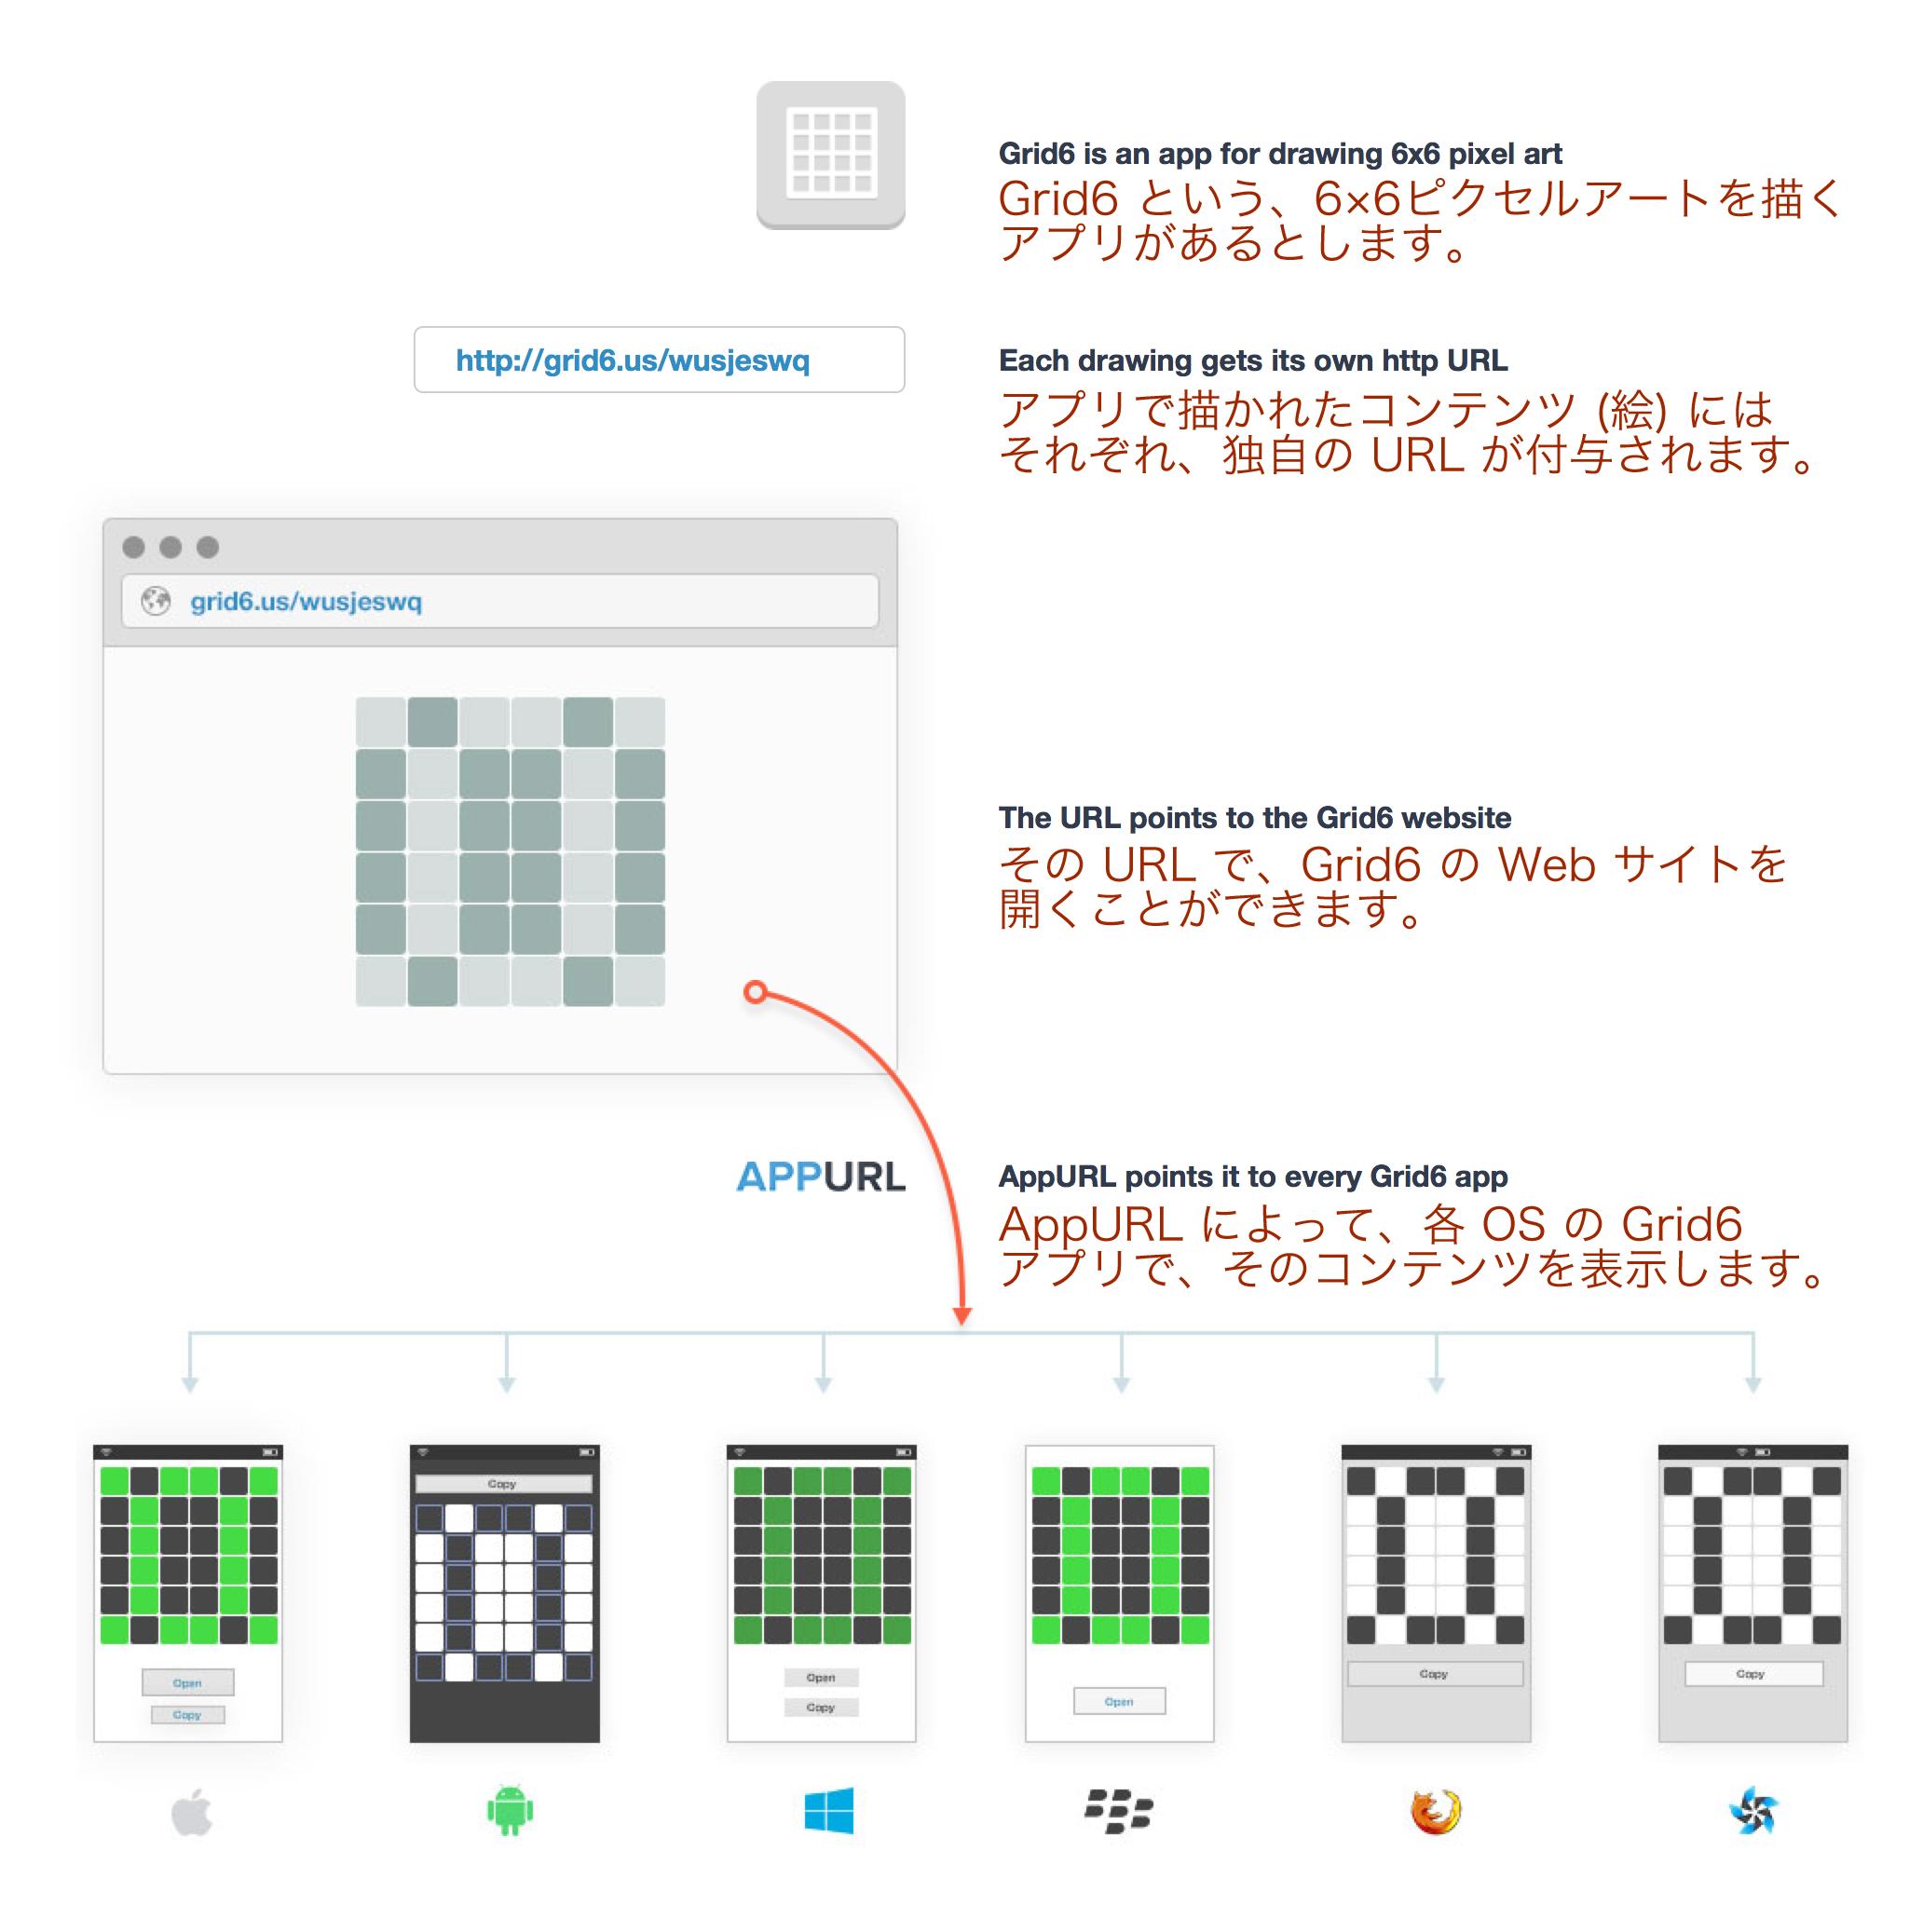 「AppURL」の概念図